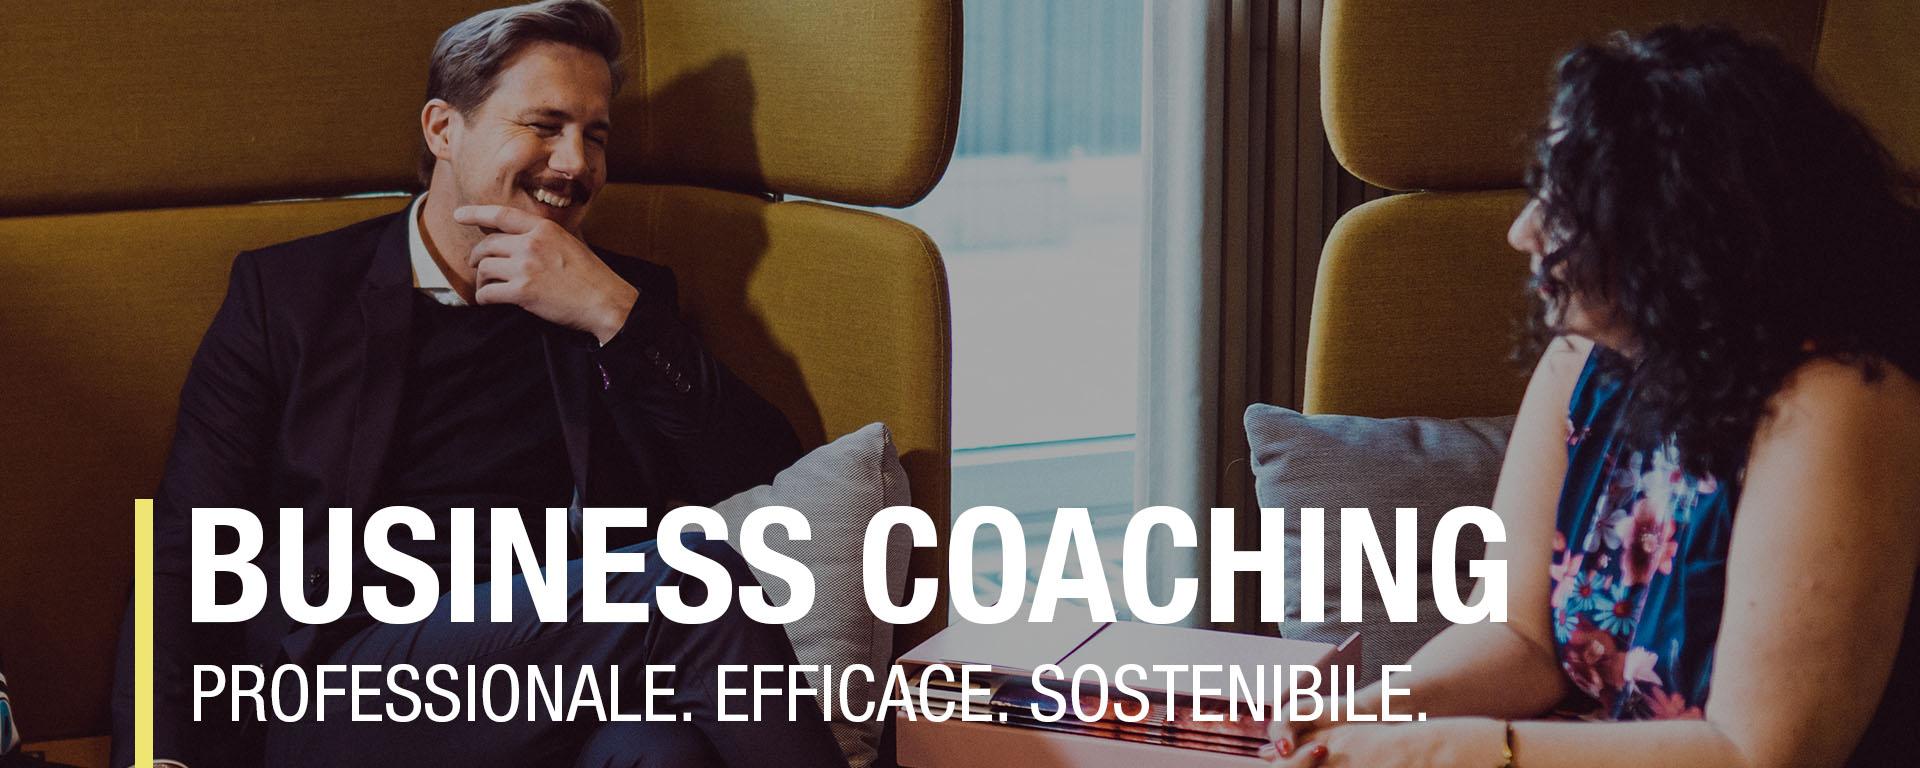 Coaching online, Business Coaching, Leadership, Formazione sulla leadership